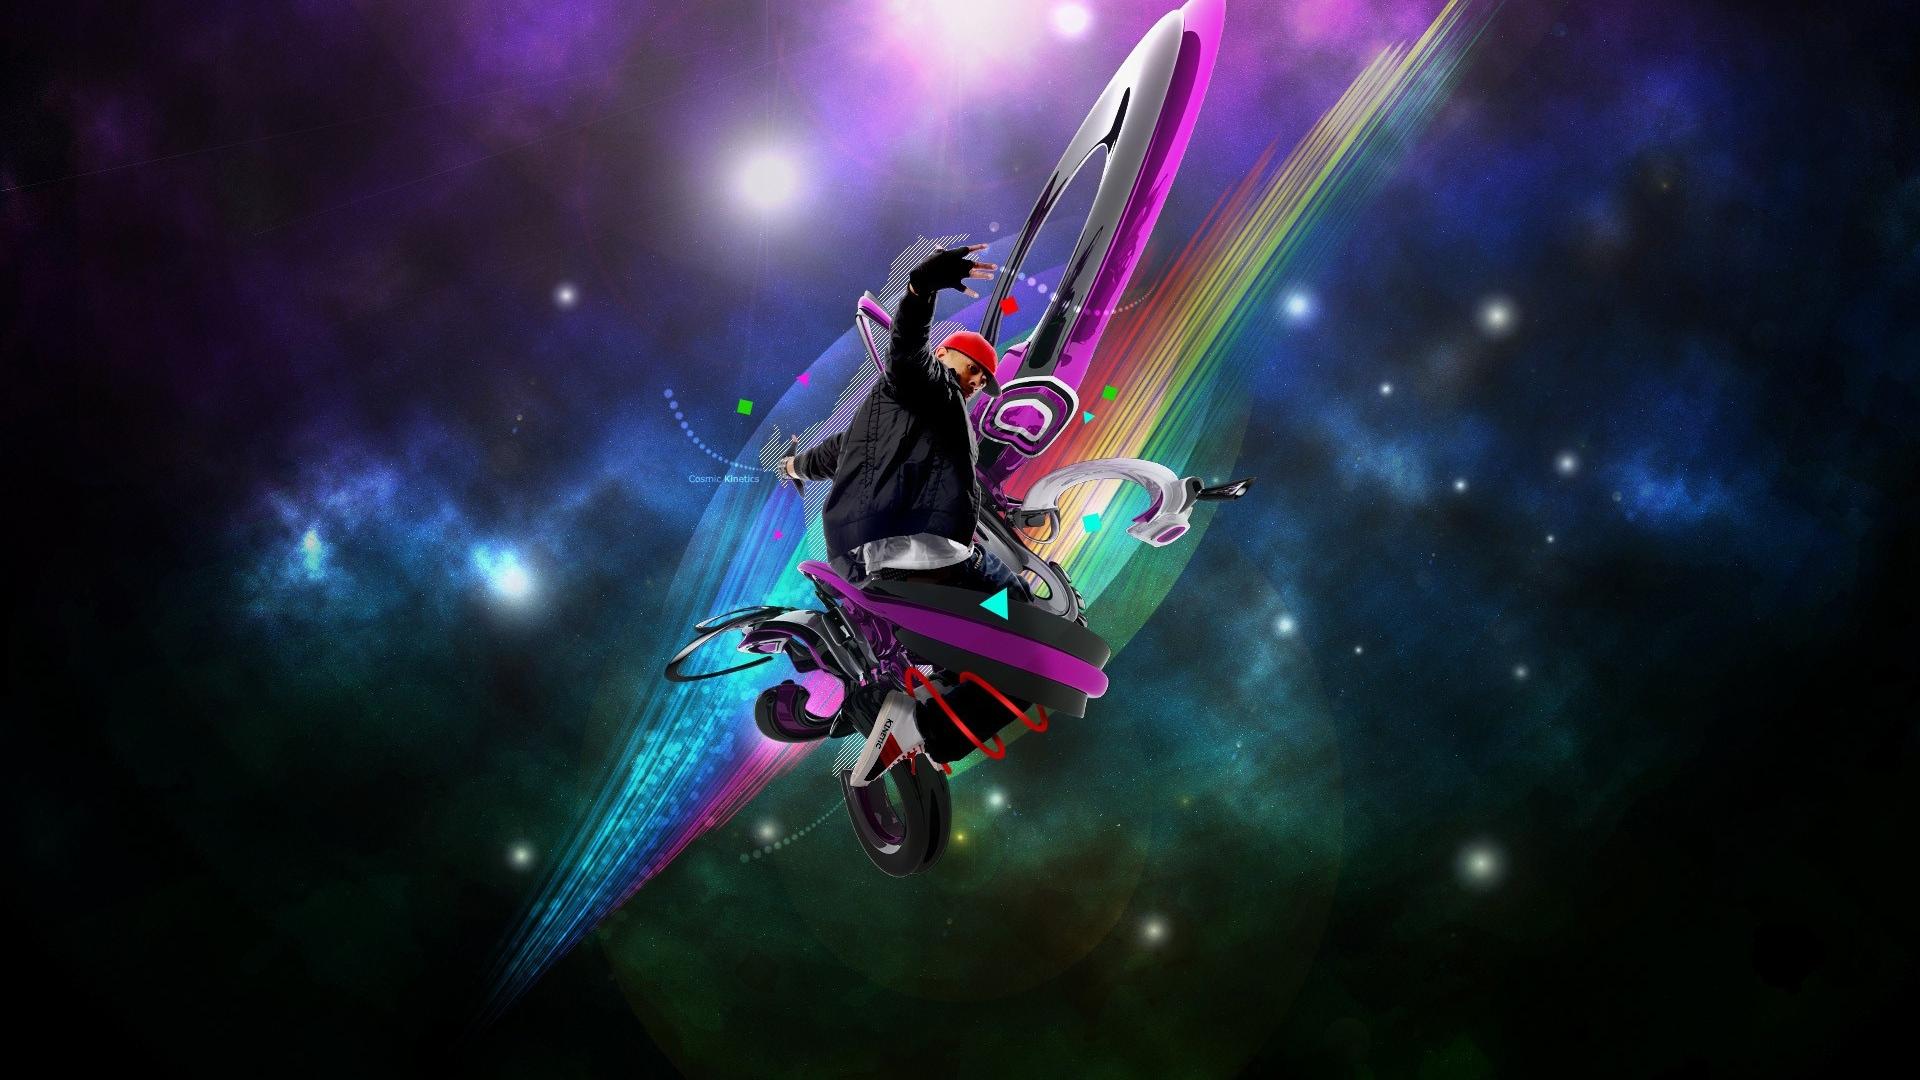 Hd Dance Backgrounds Download Pixelstalknet